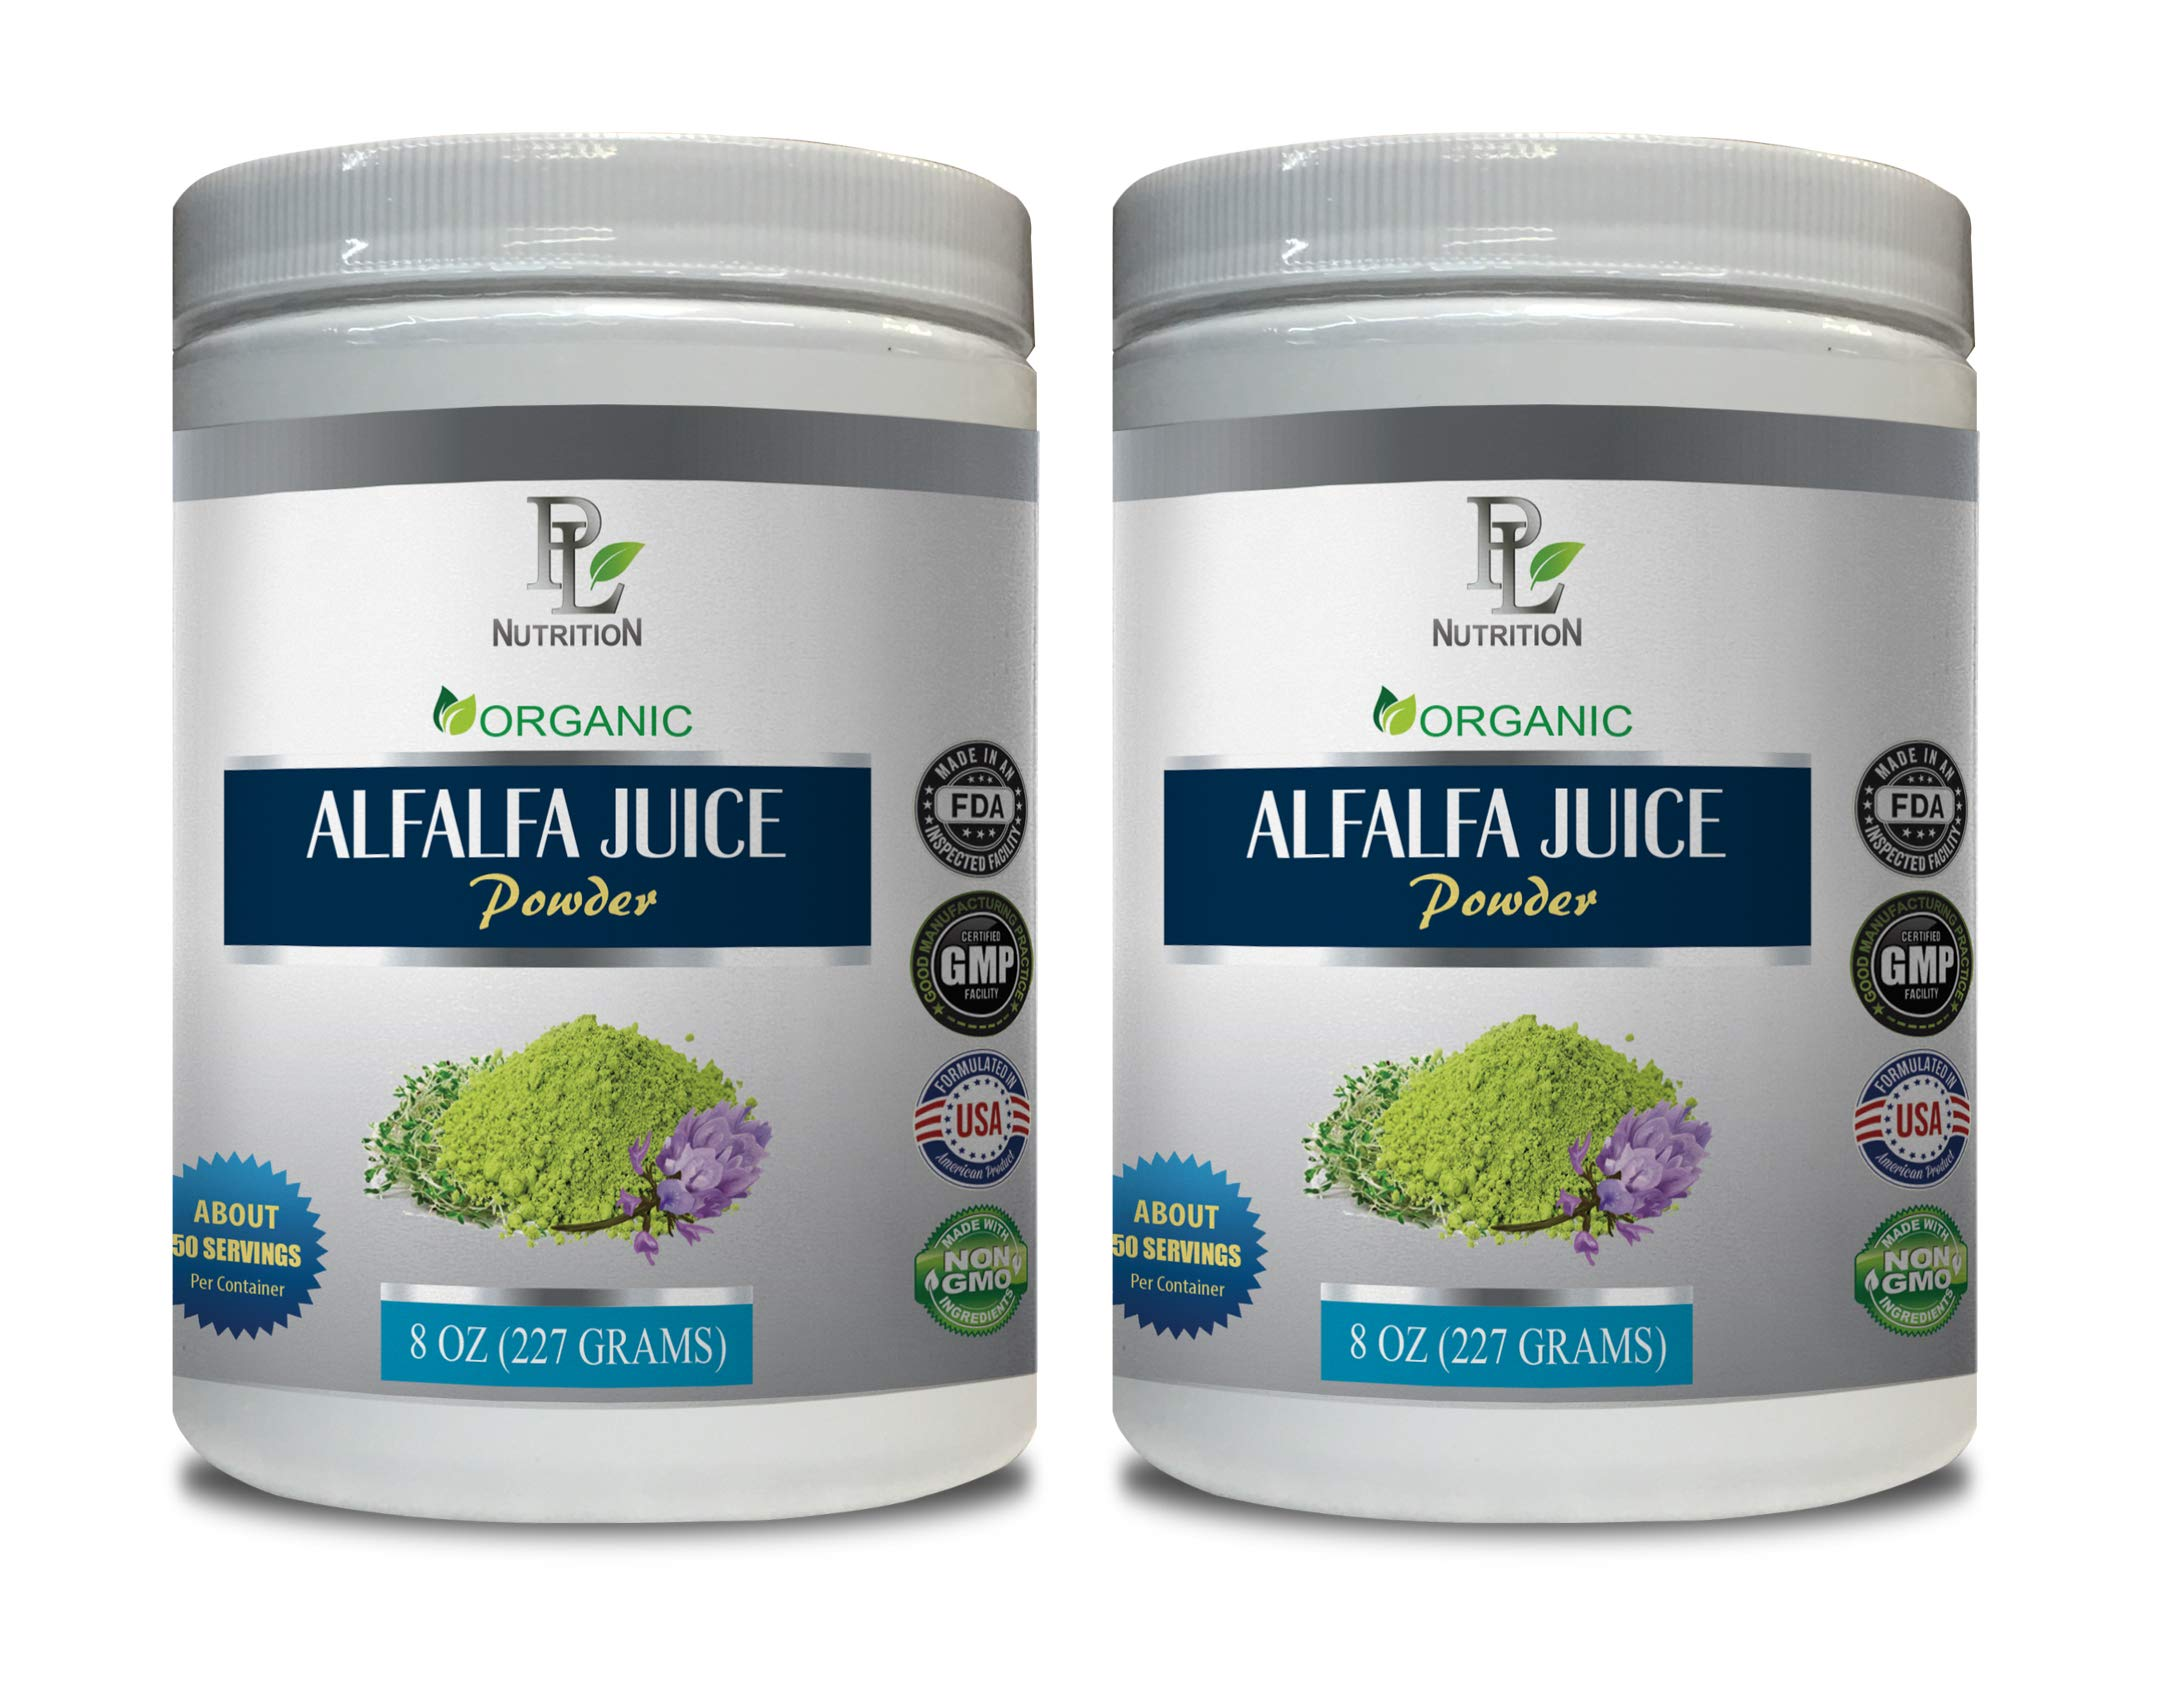 Cholesterol Natural Supplements - Alfalfa Organic - Juice Powder - Alfalfa Powder Bulk - 2 Cans 16 OZ (100 Servings) by PL NUTRITION